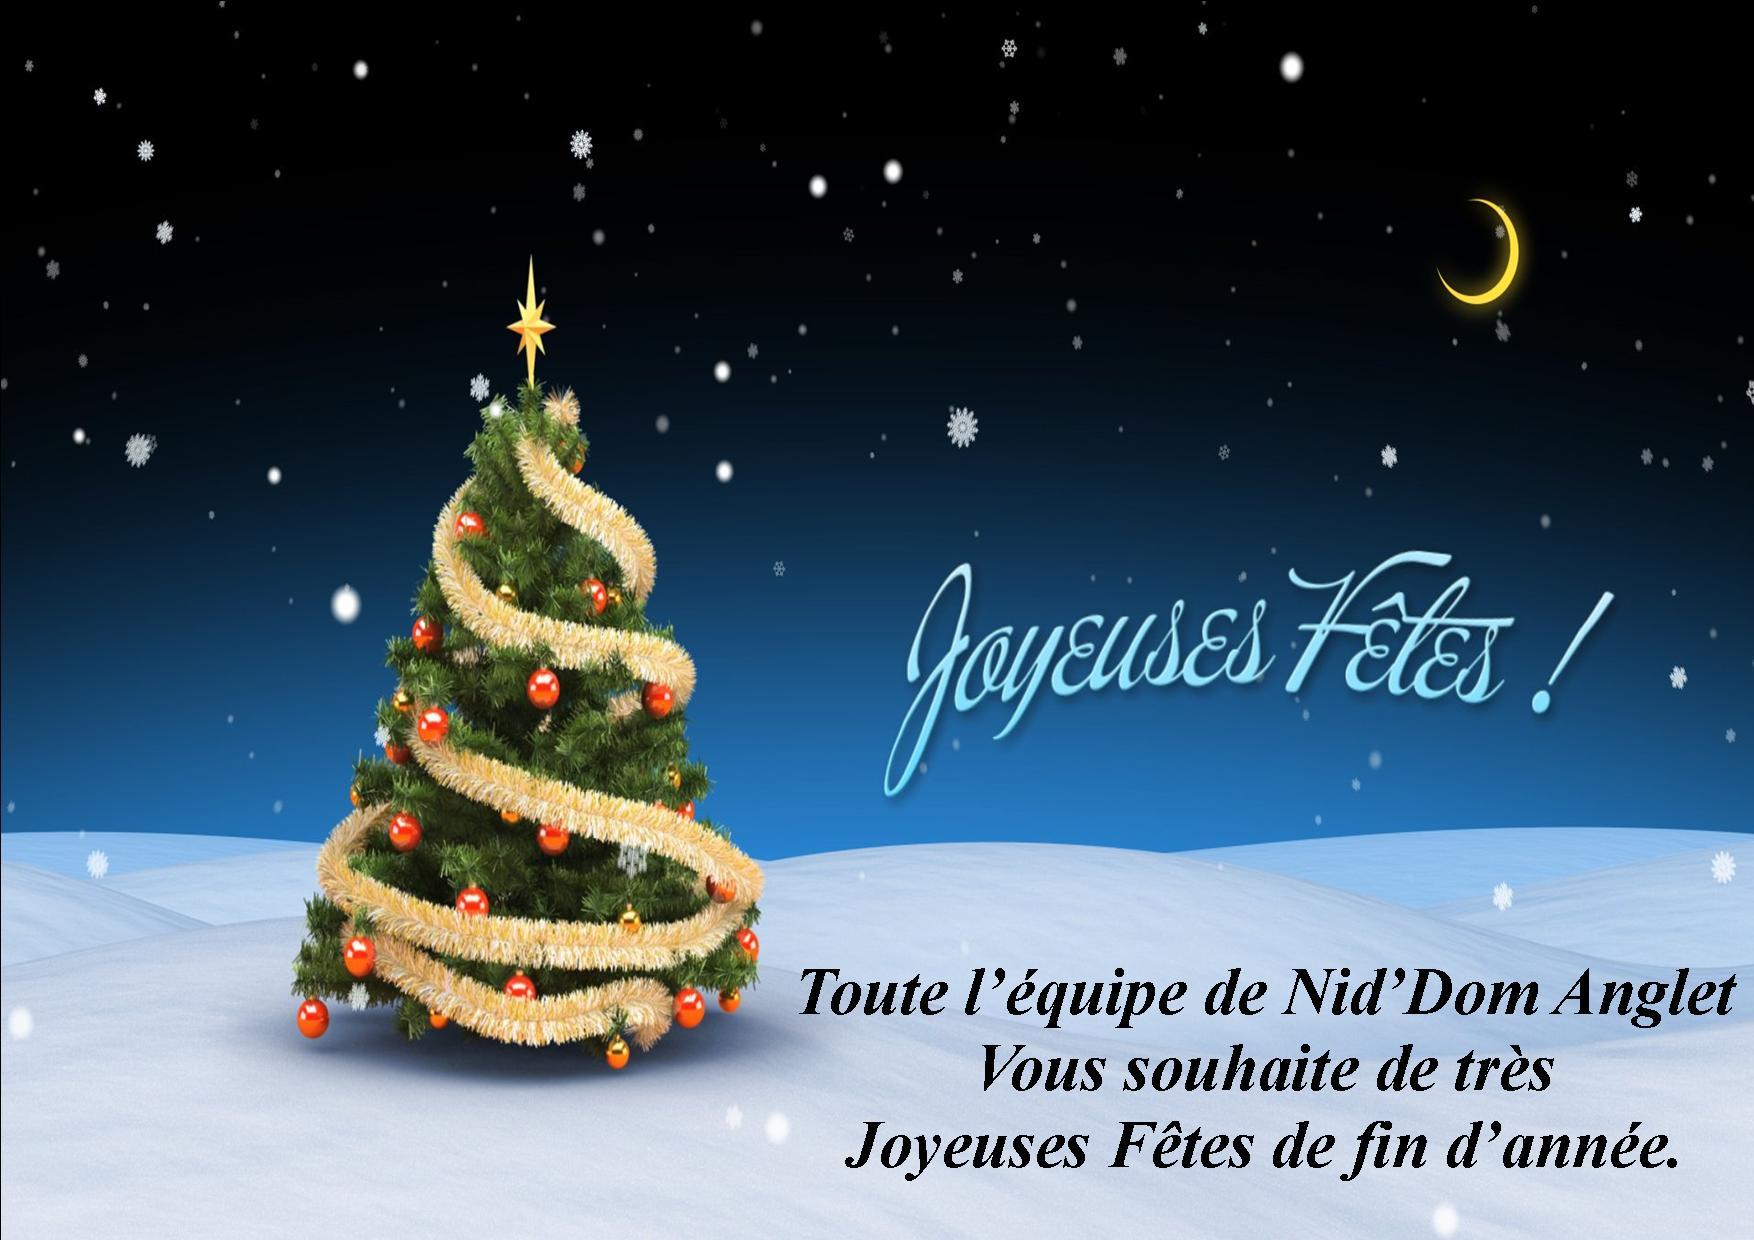 Joyeuses fêtes Niddom Anglet